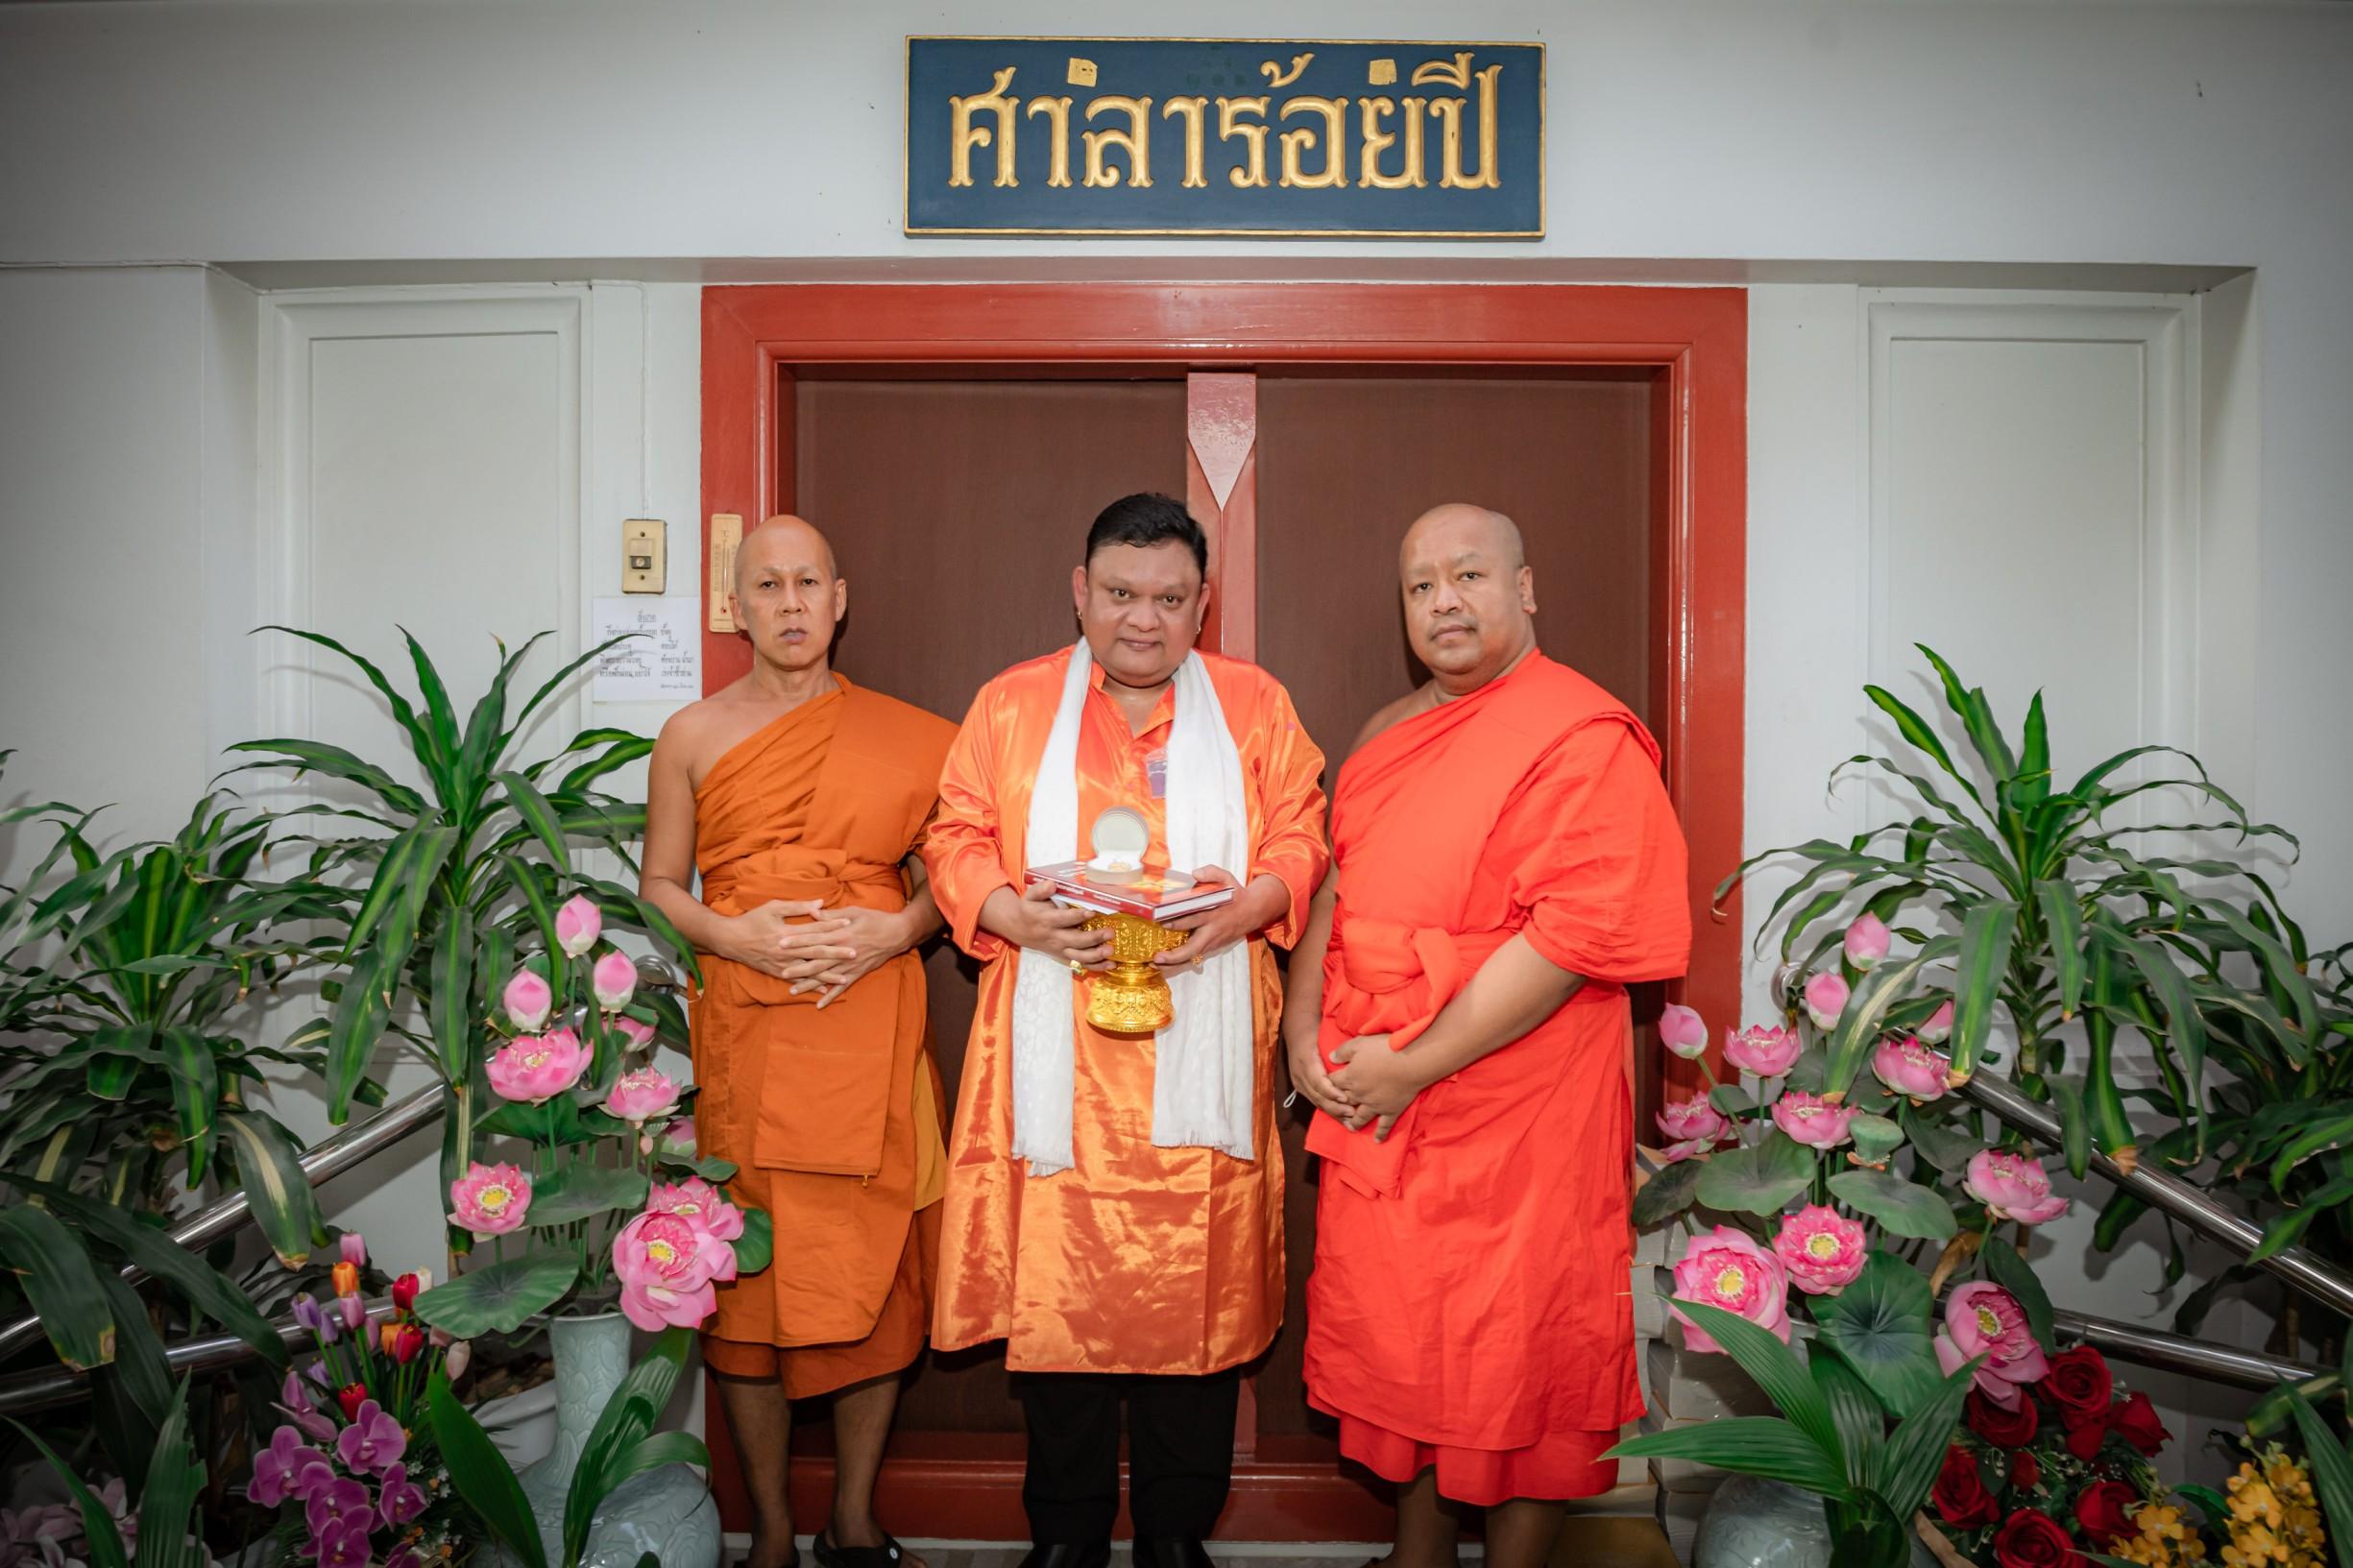 Guruji Shrii Arnav with Senior Monks of the Wat Paknum Temple